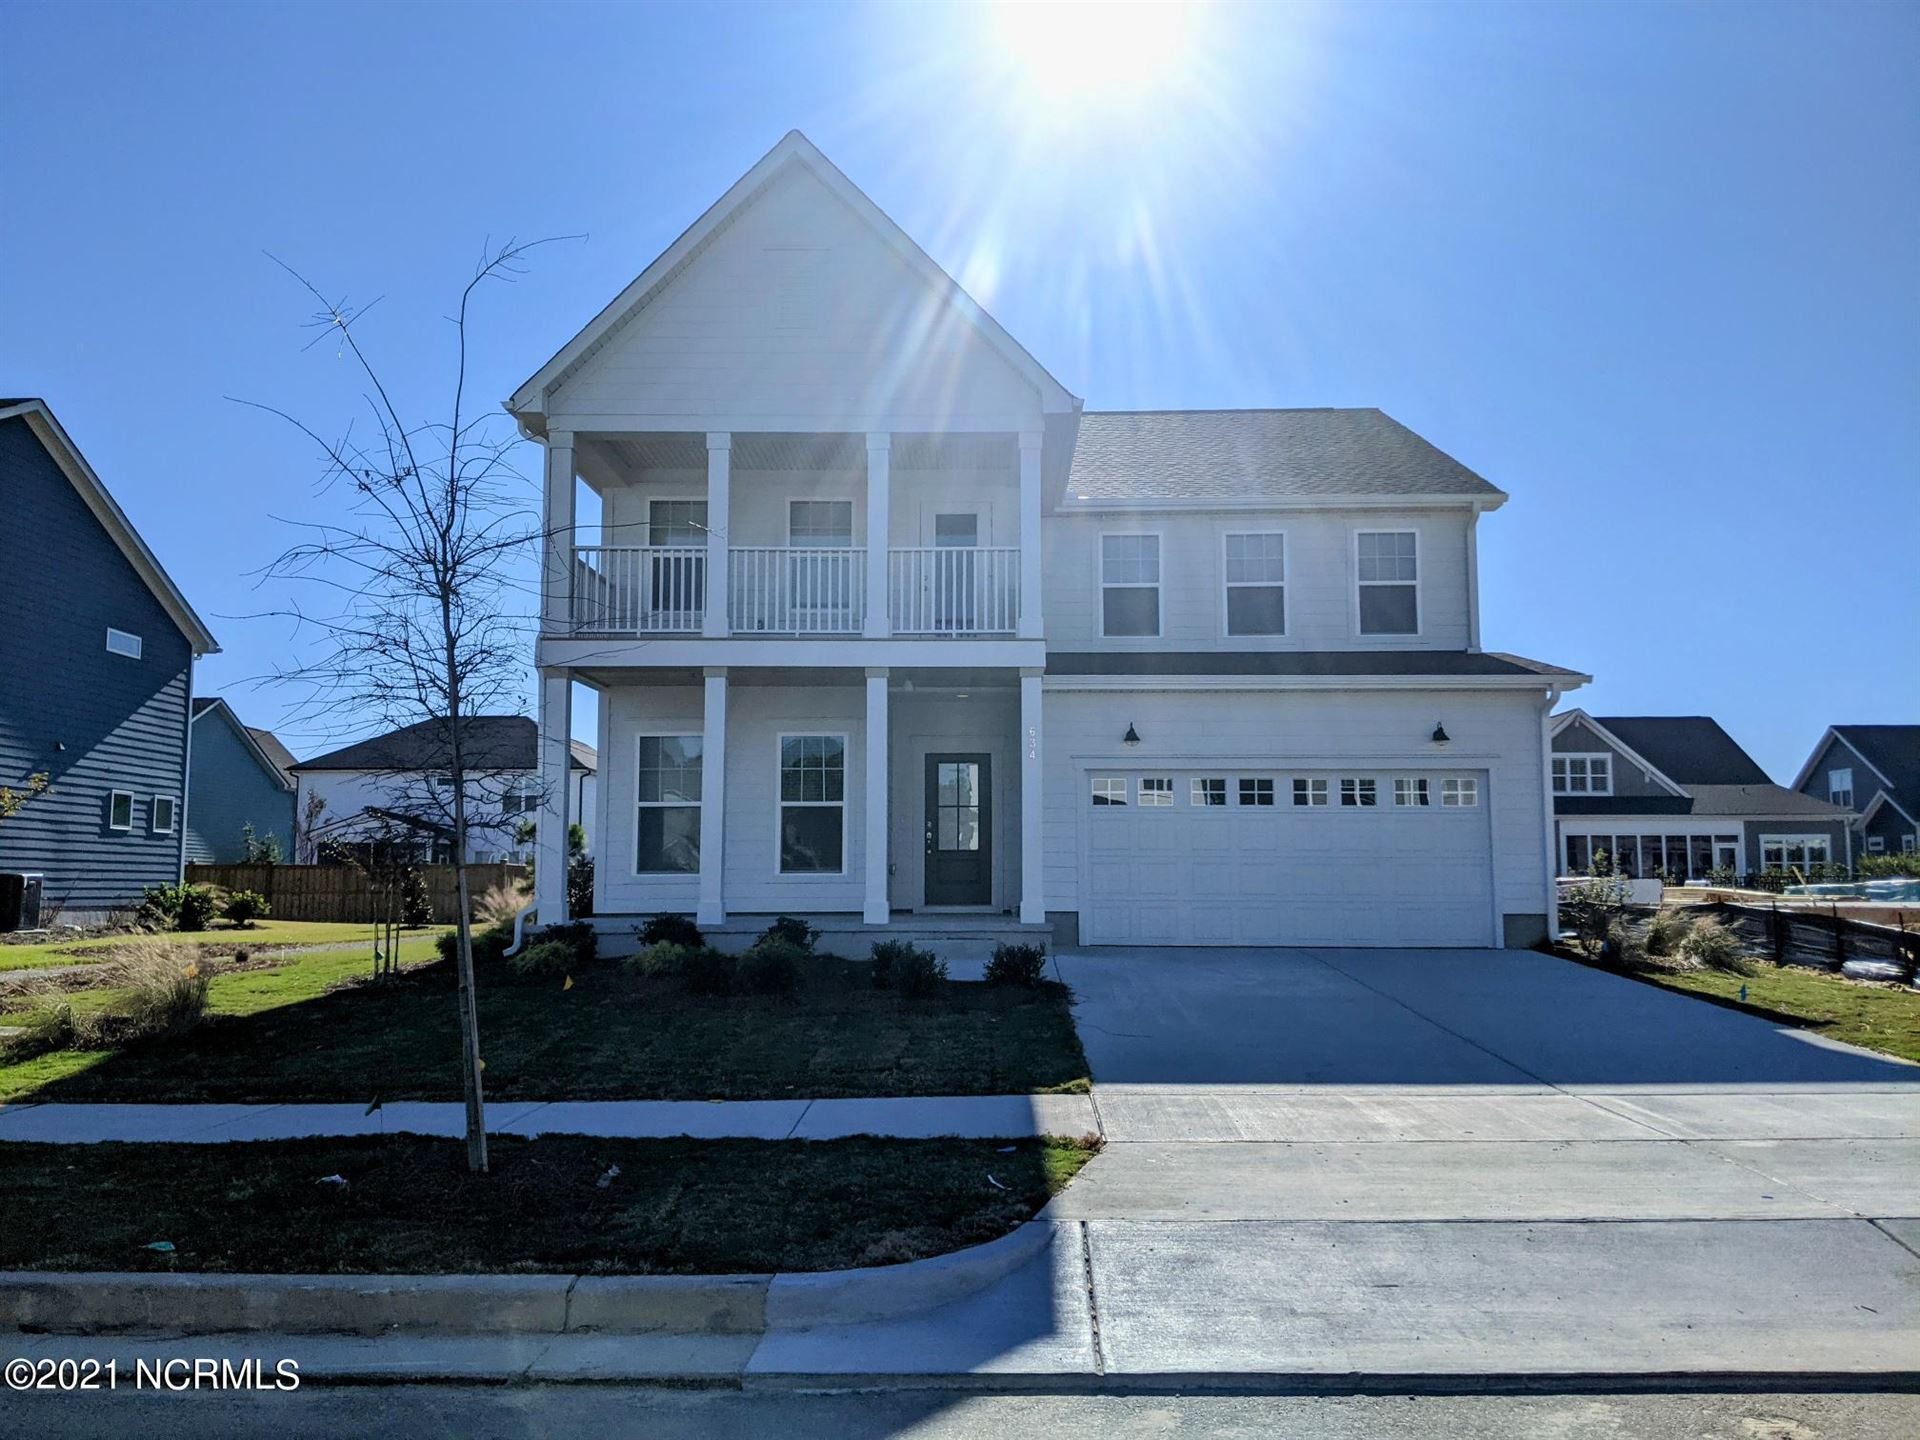 Photo of 634 Edgerton Drive, Wilmington, NC 28412 (MLS # 100270637)